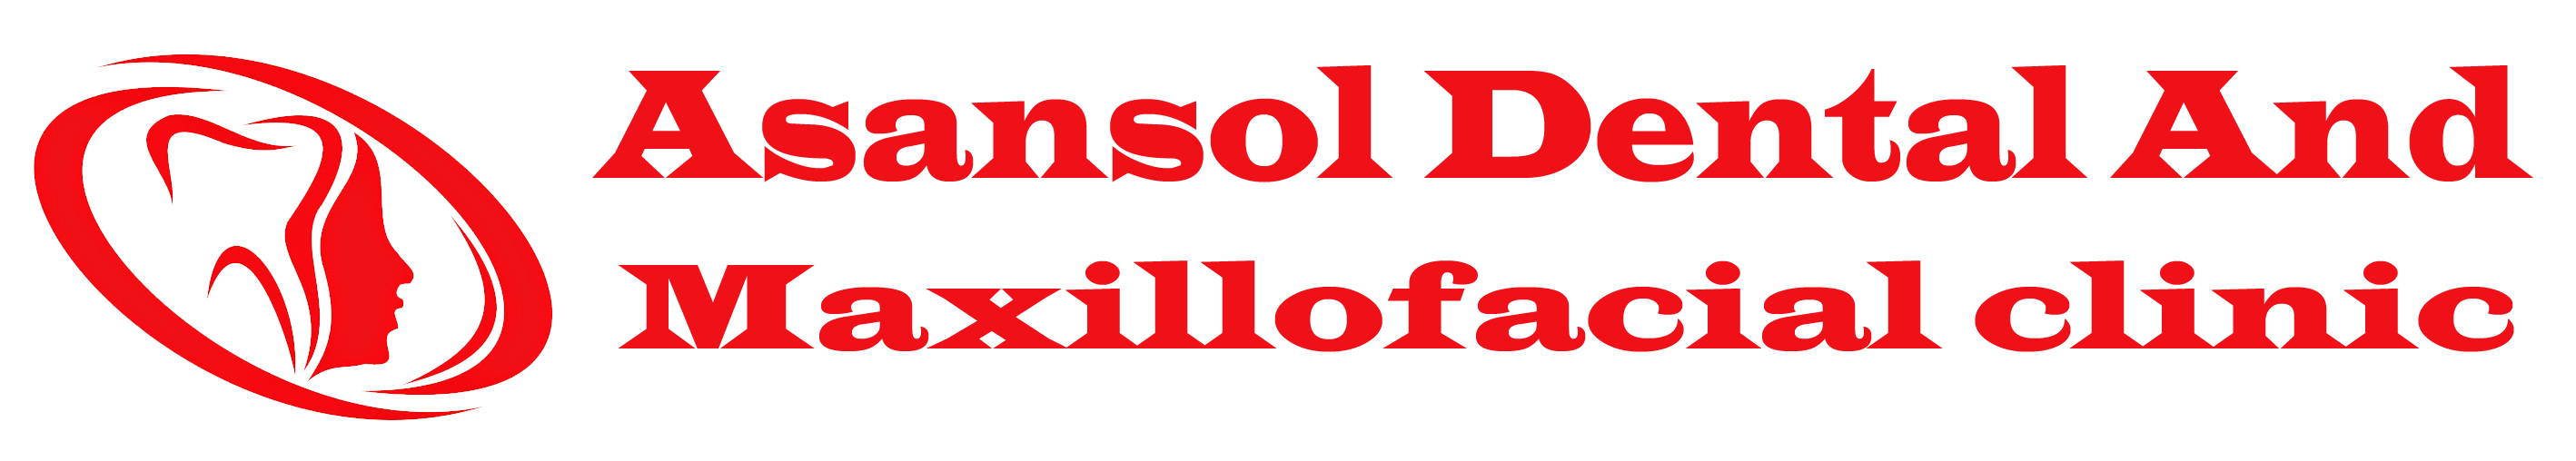 Asansol Dental